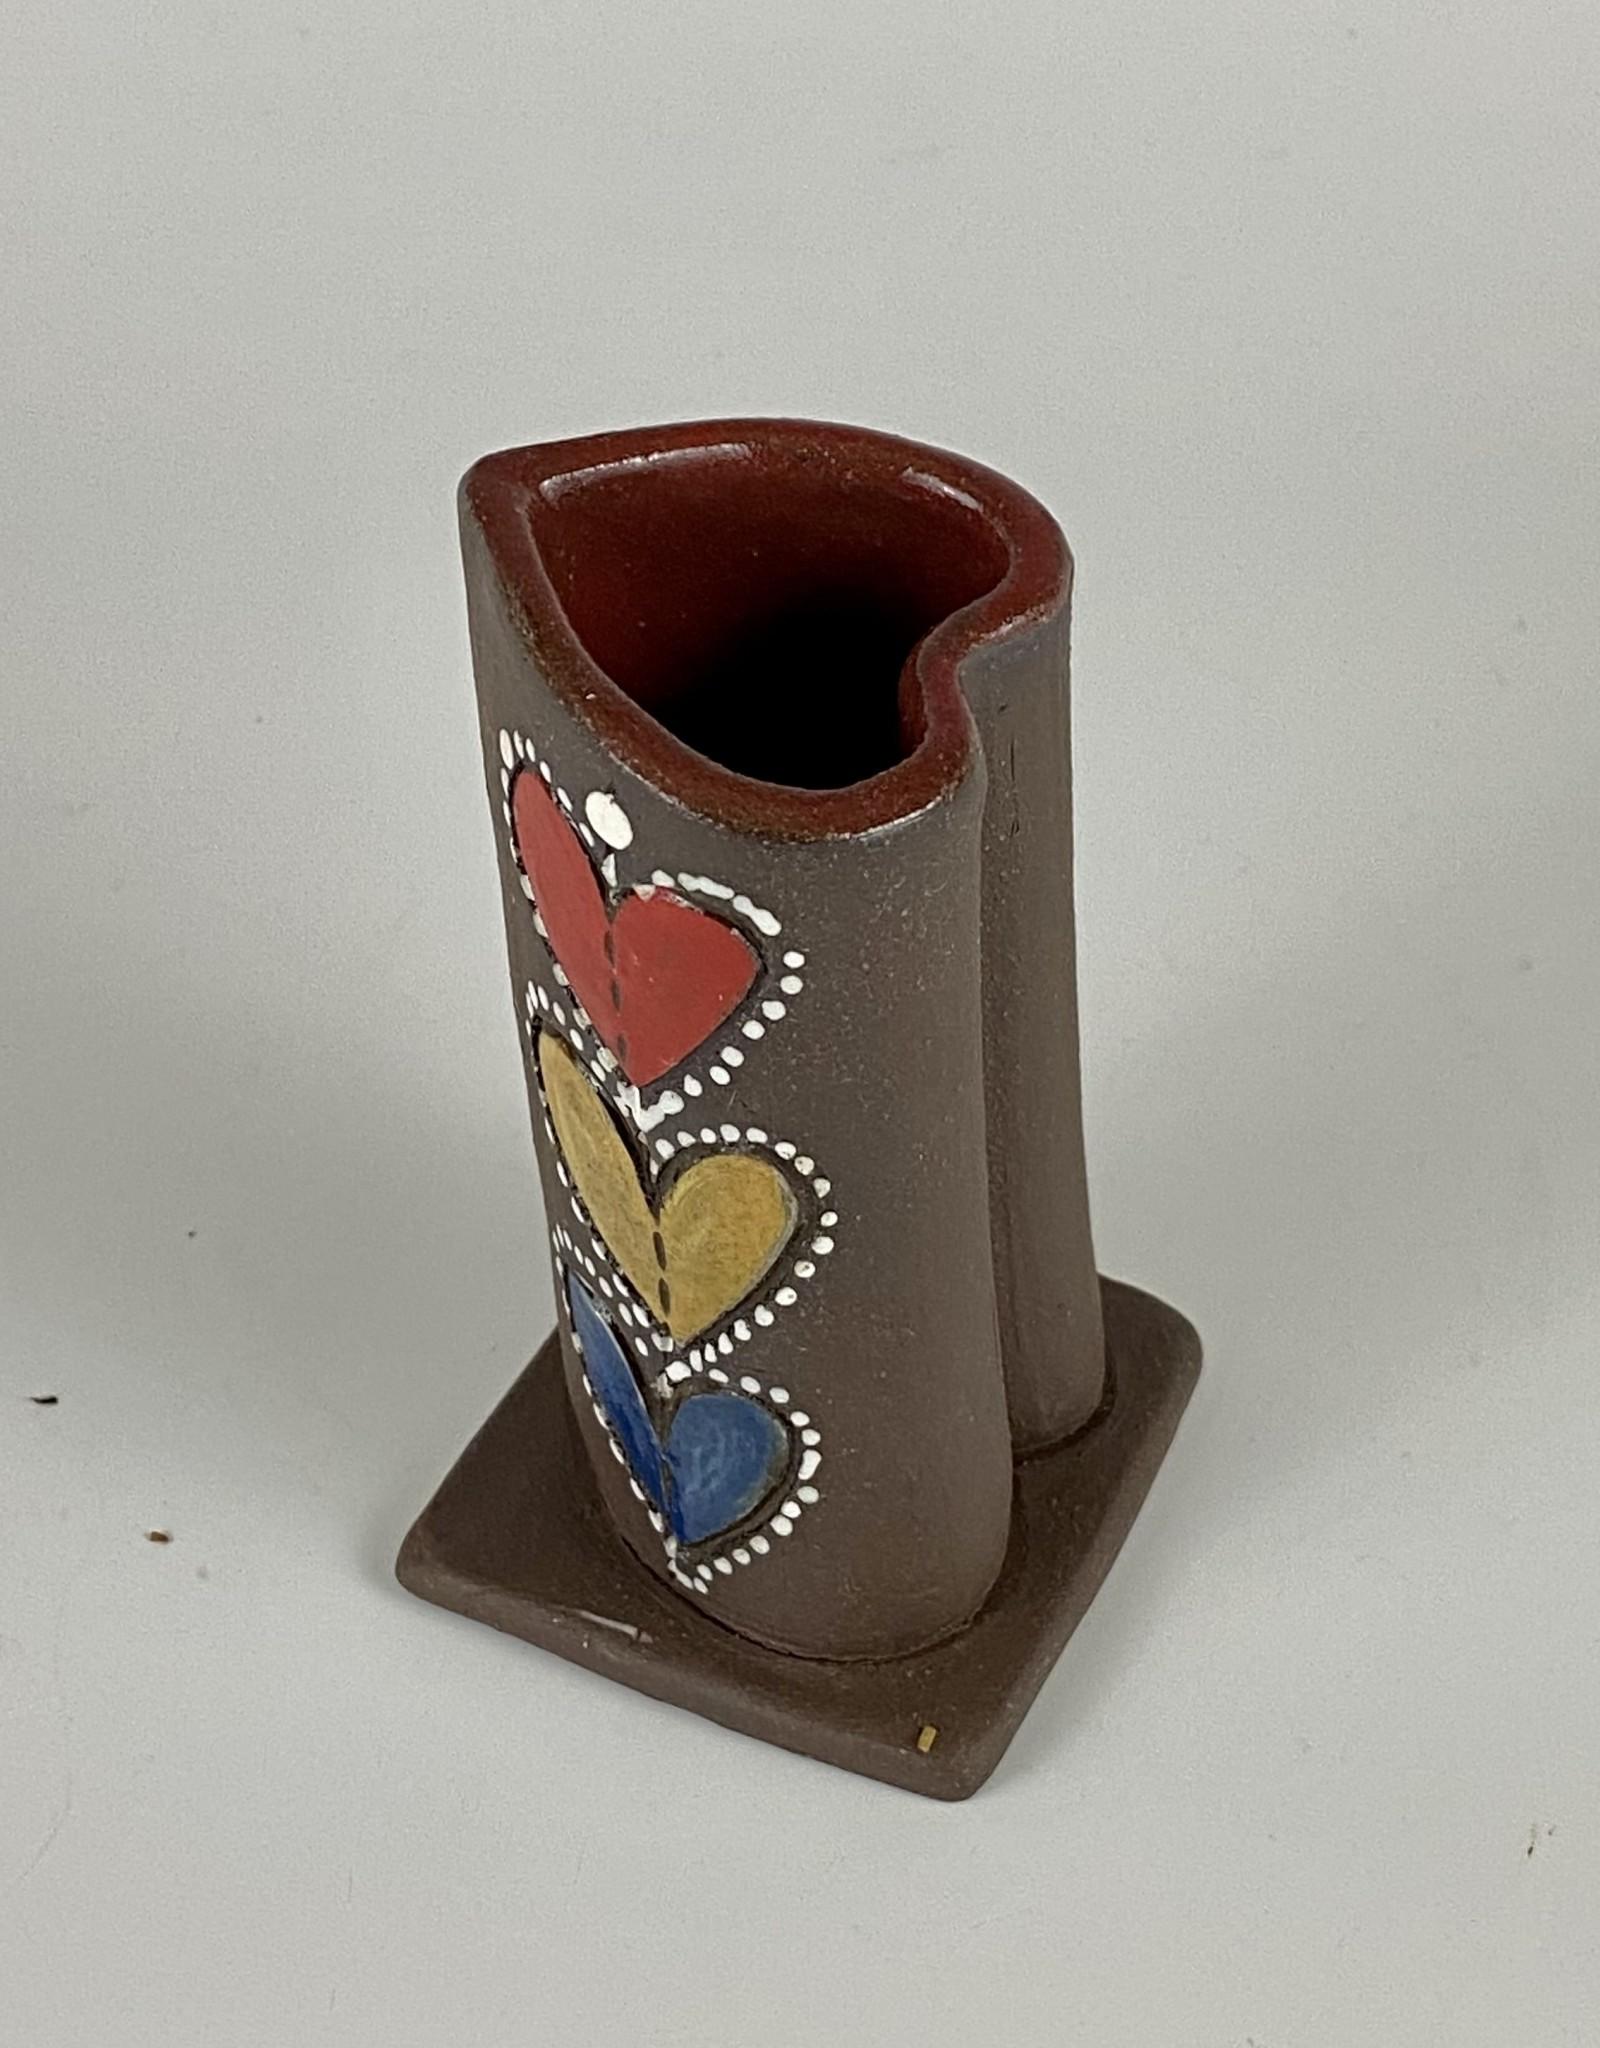 Anshula Tayal Amaati Heart vase